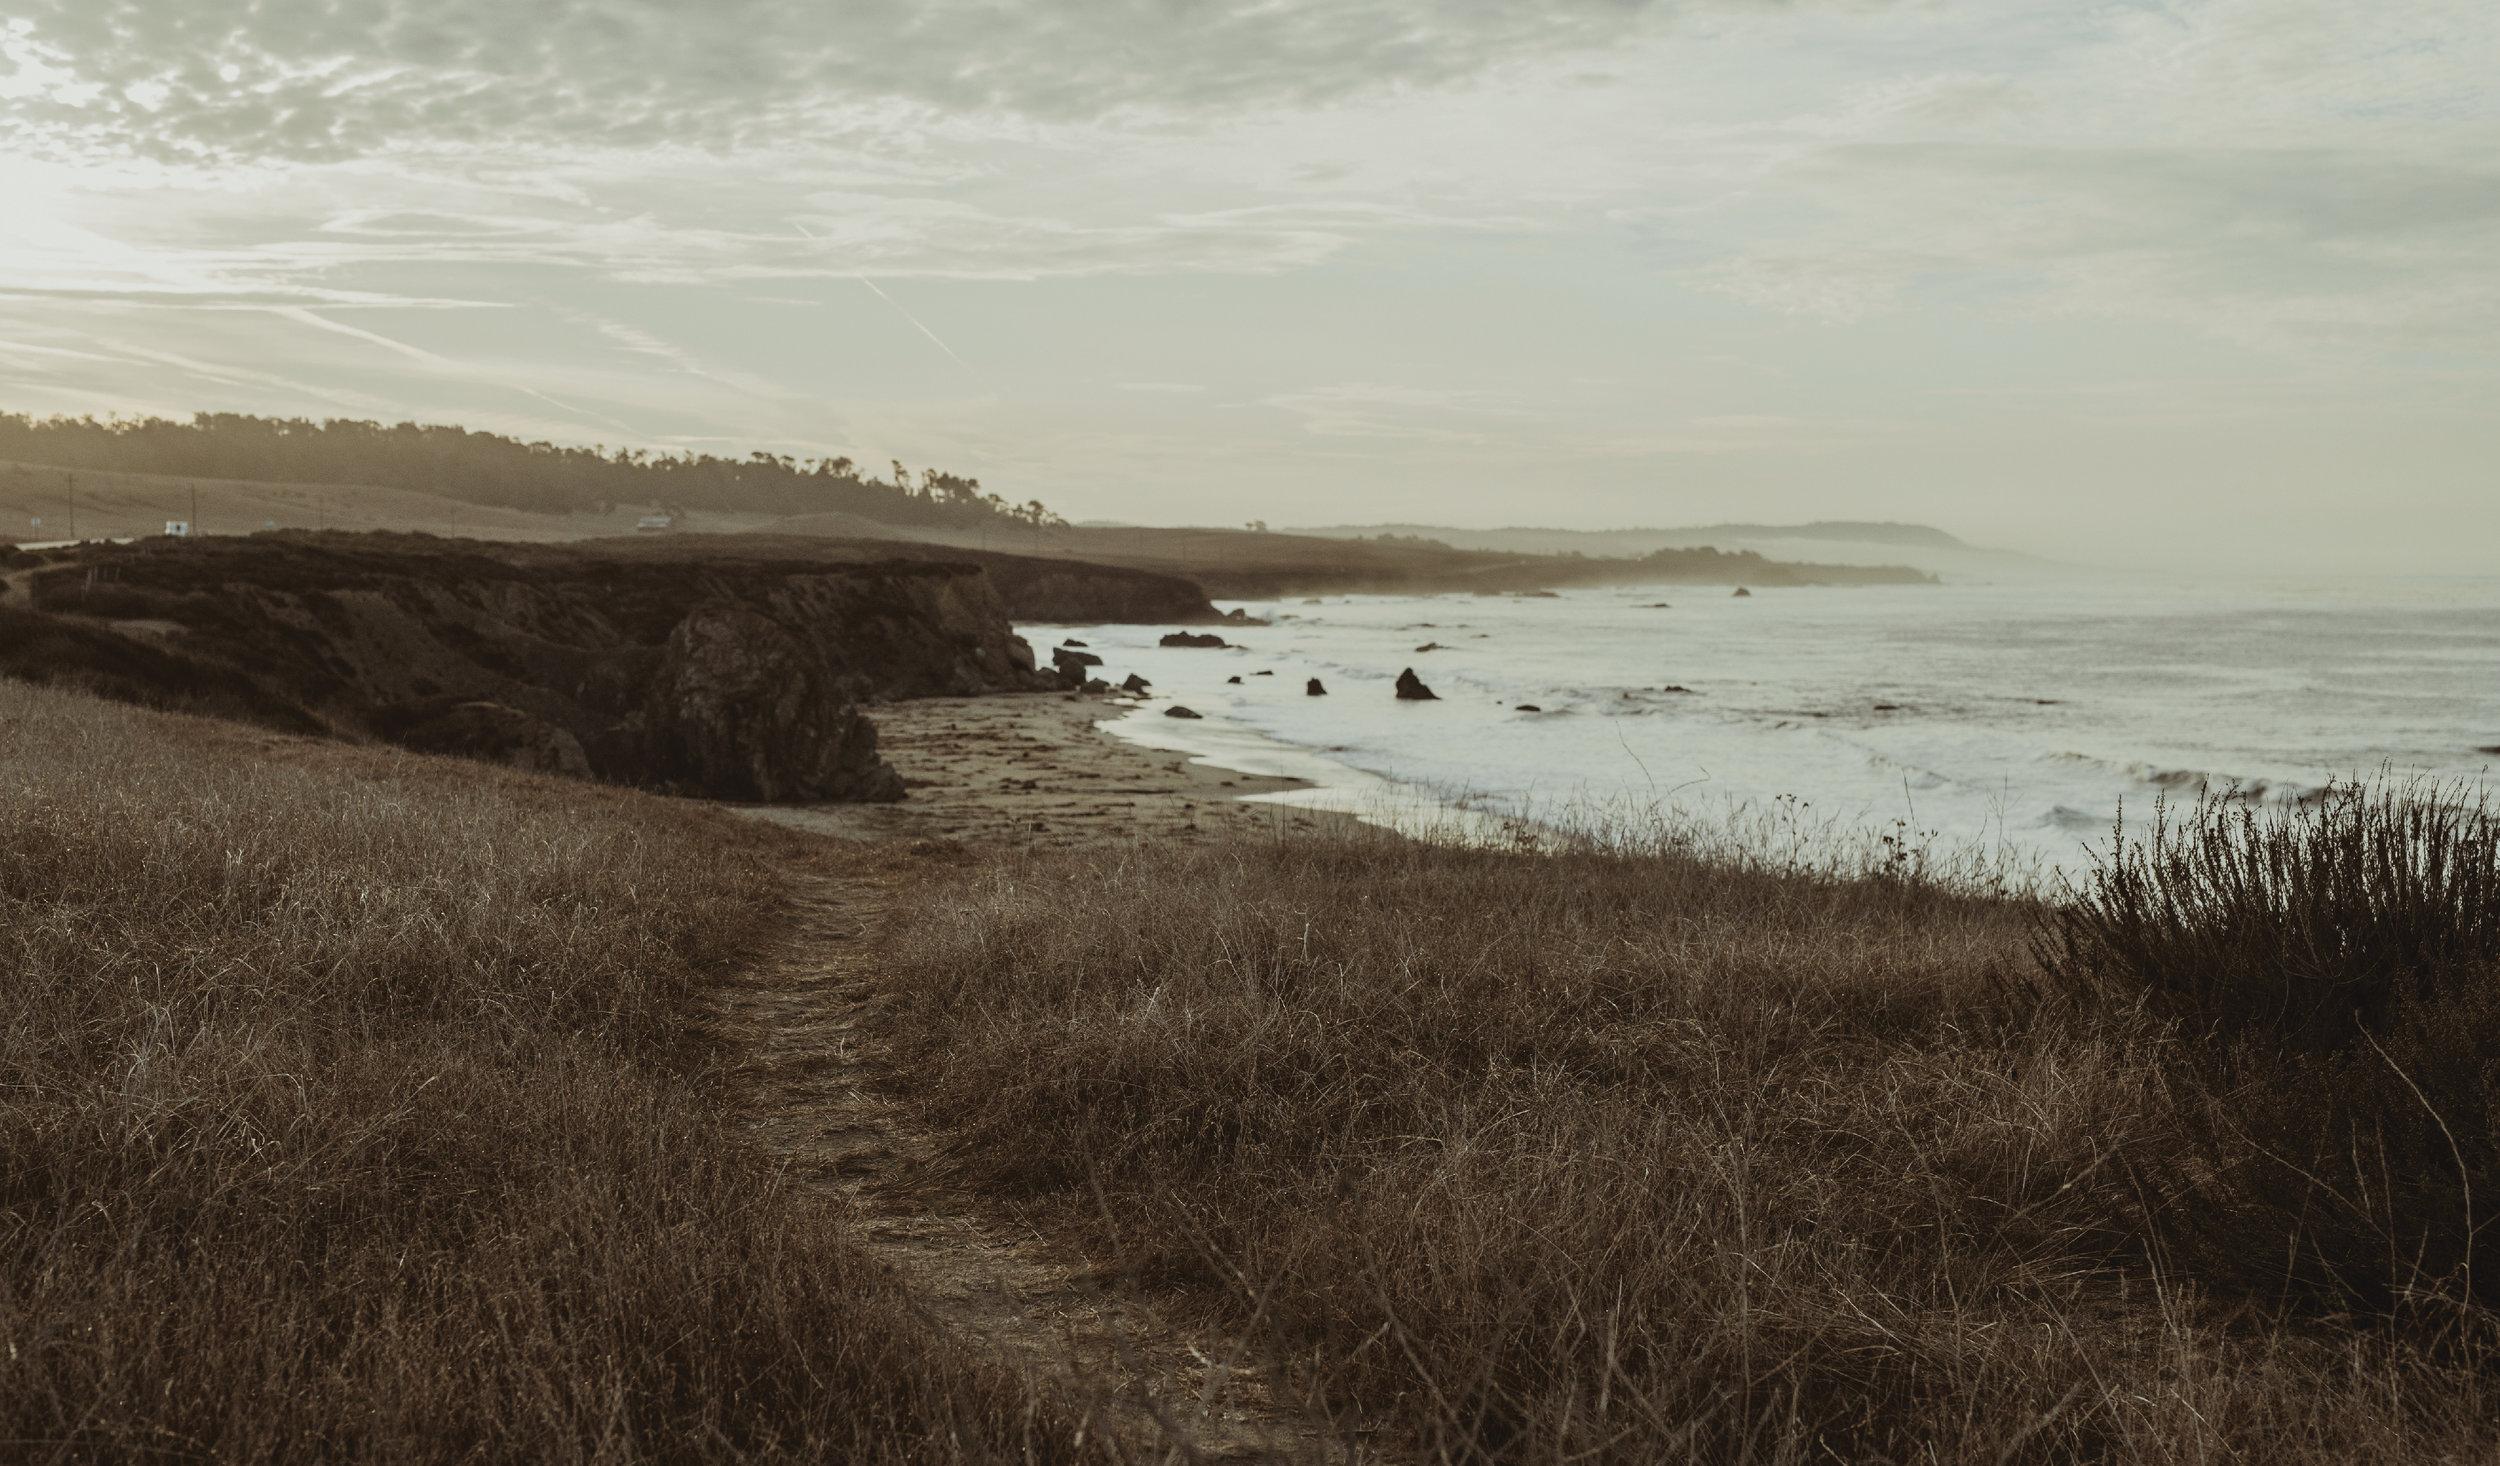 Journeywise Photography